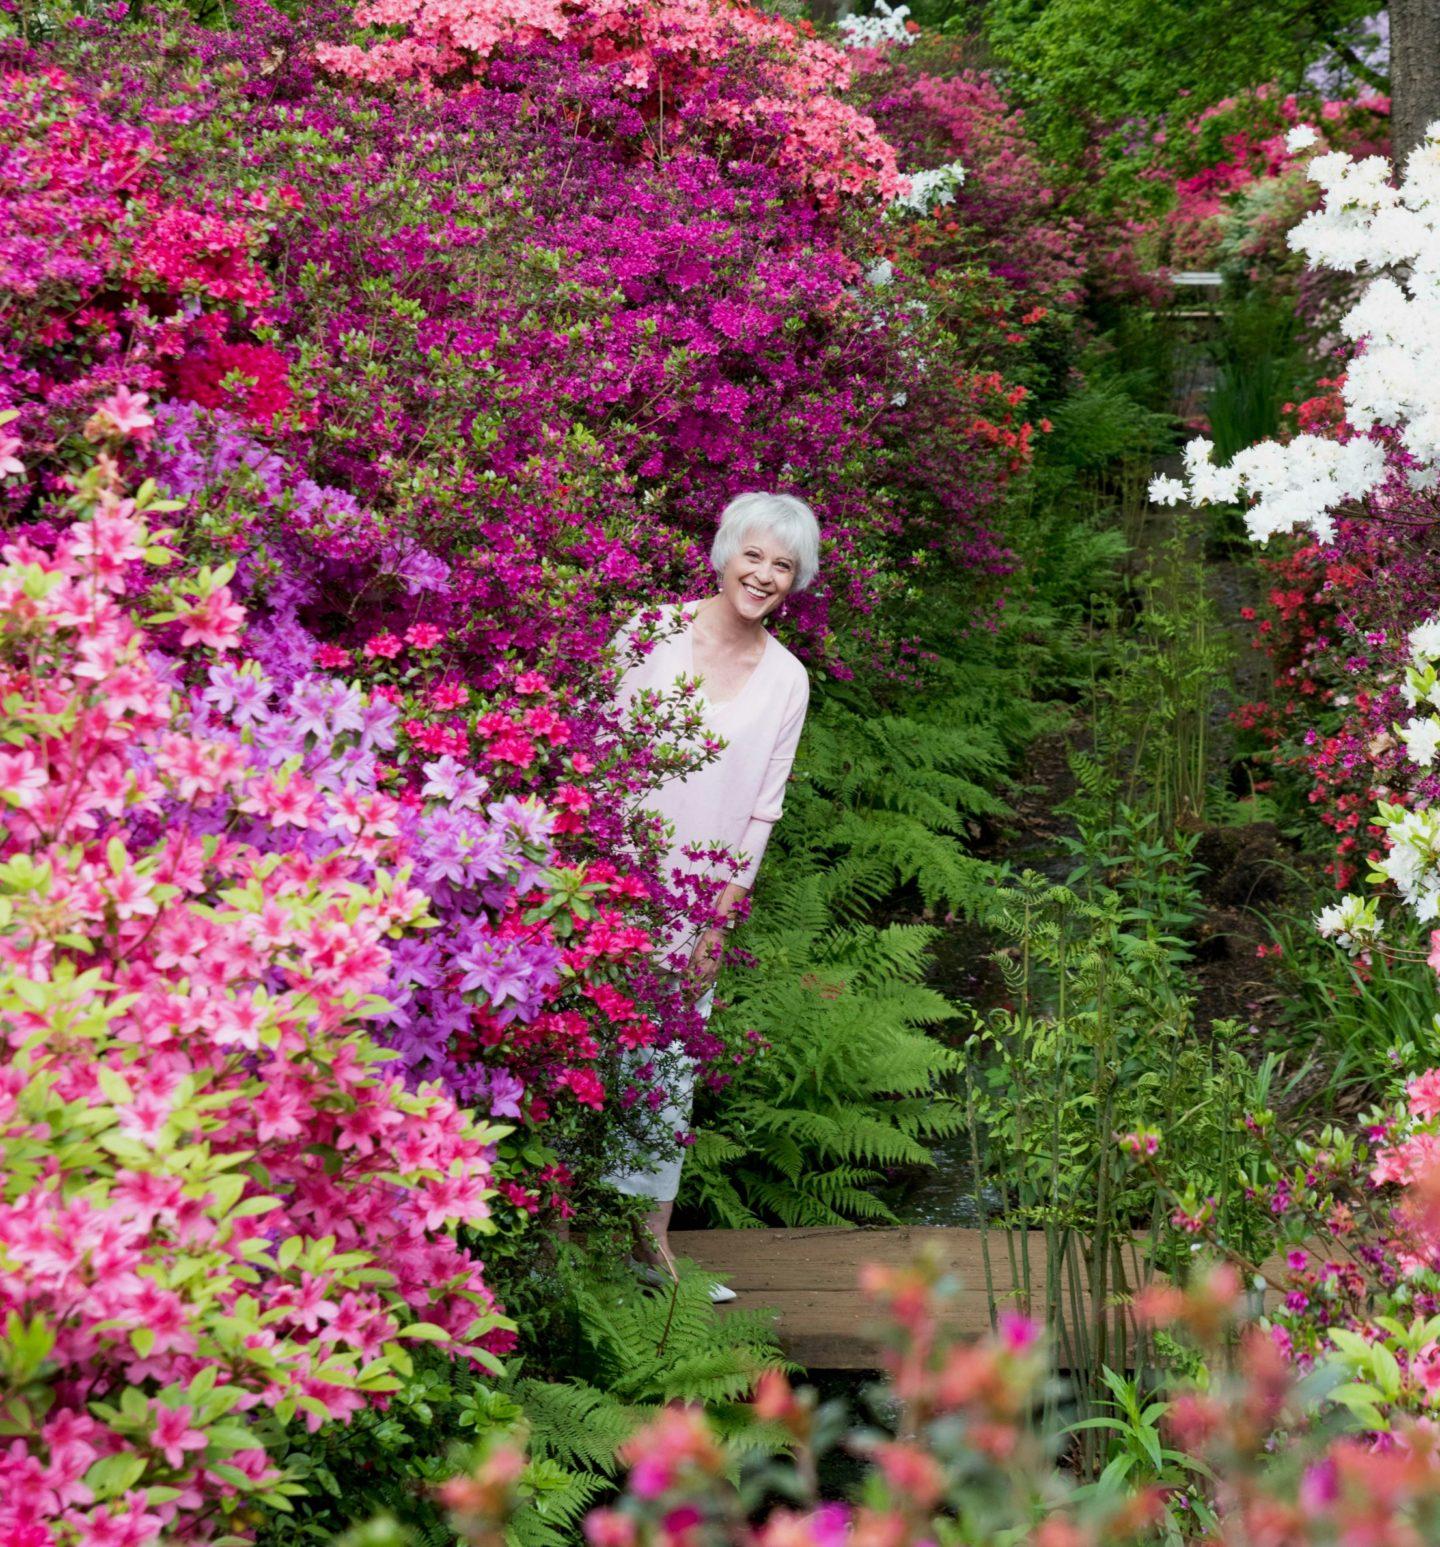 Pink swearer among azaleas